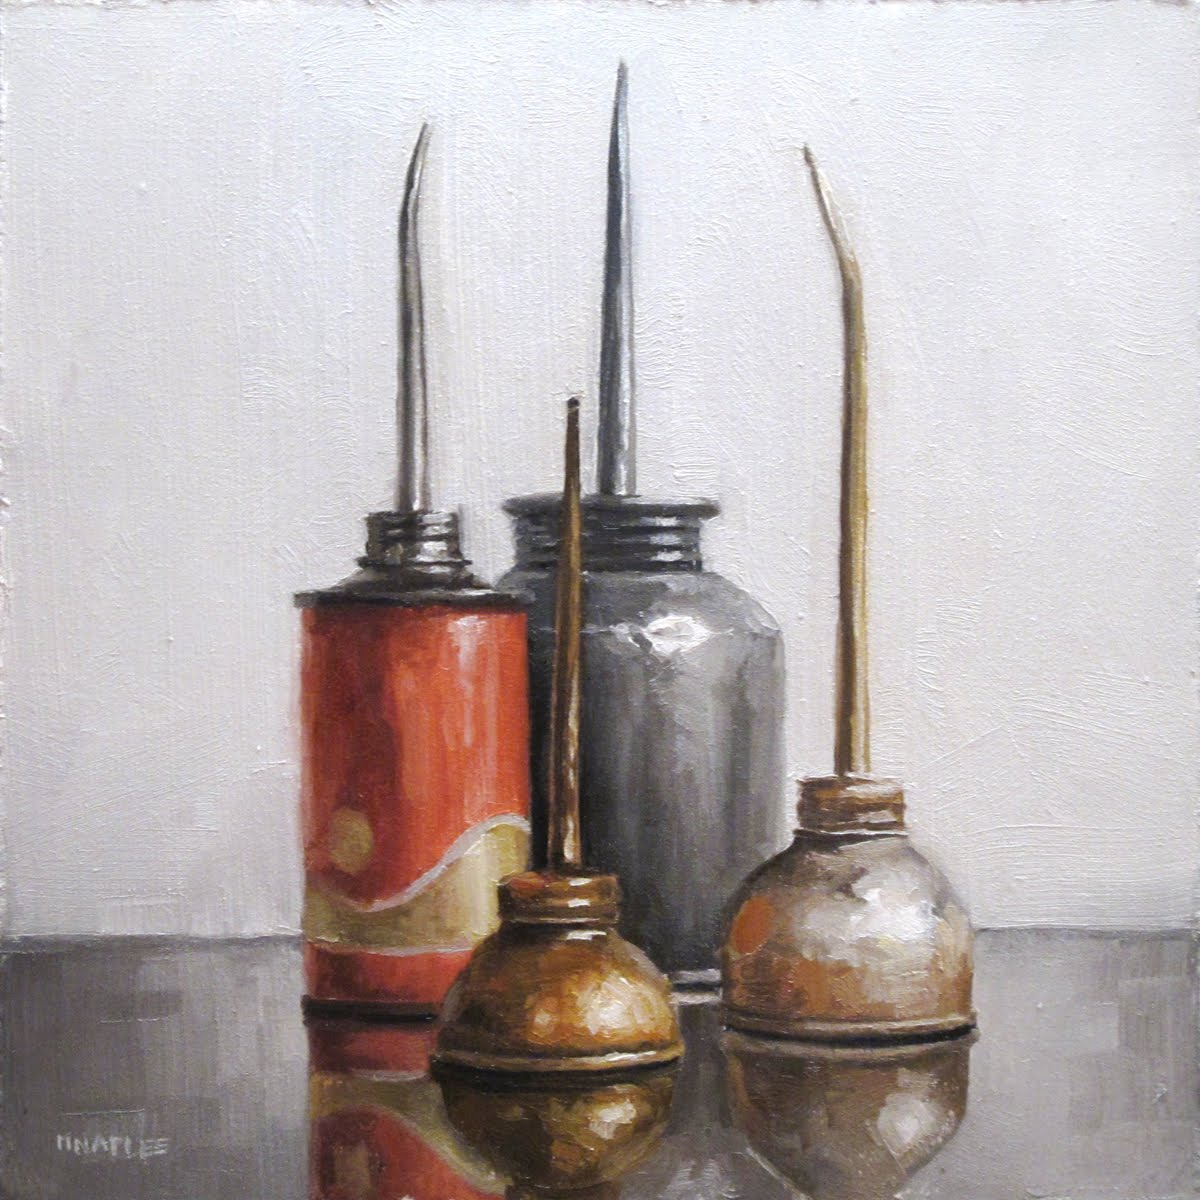 """Oil Can Cityscape"" original fine art by Michael Naples"